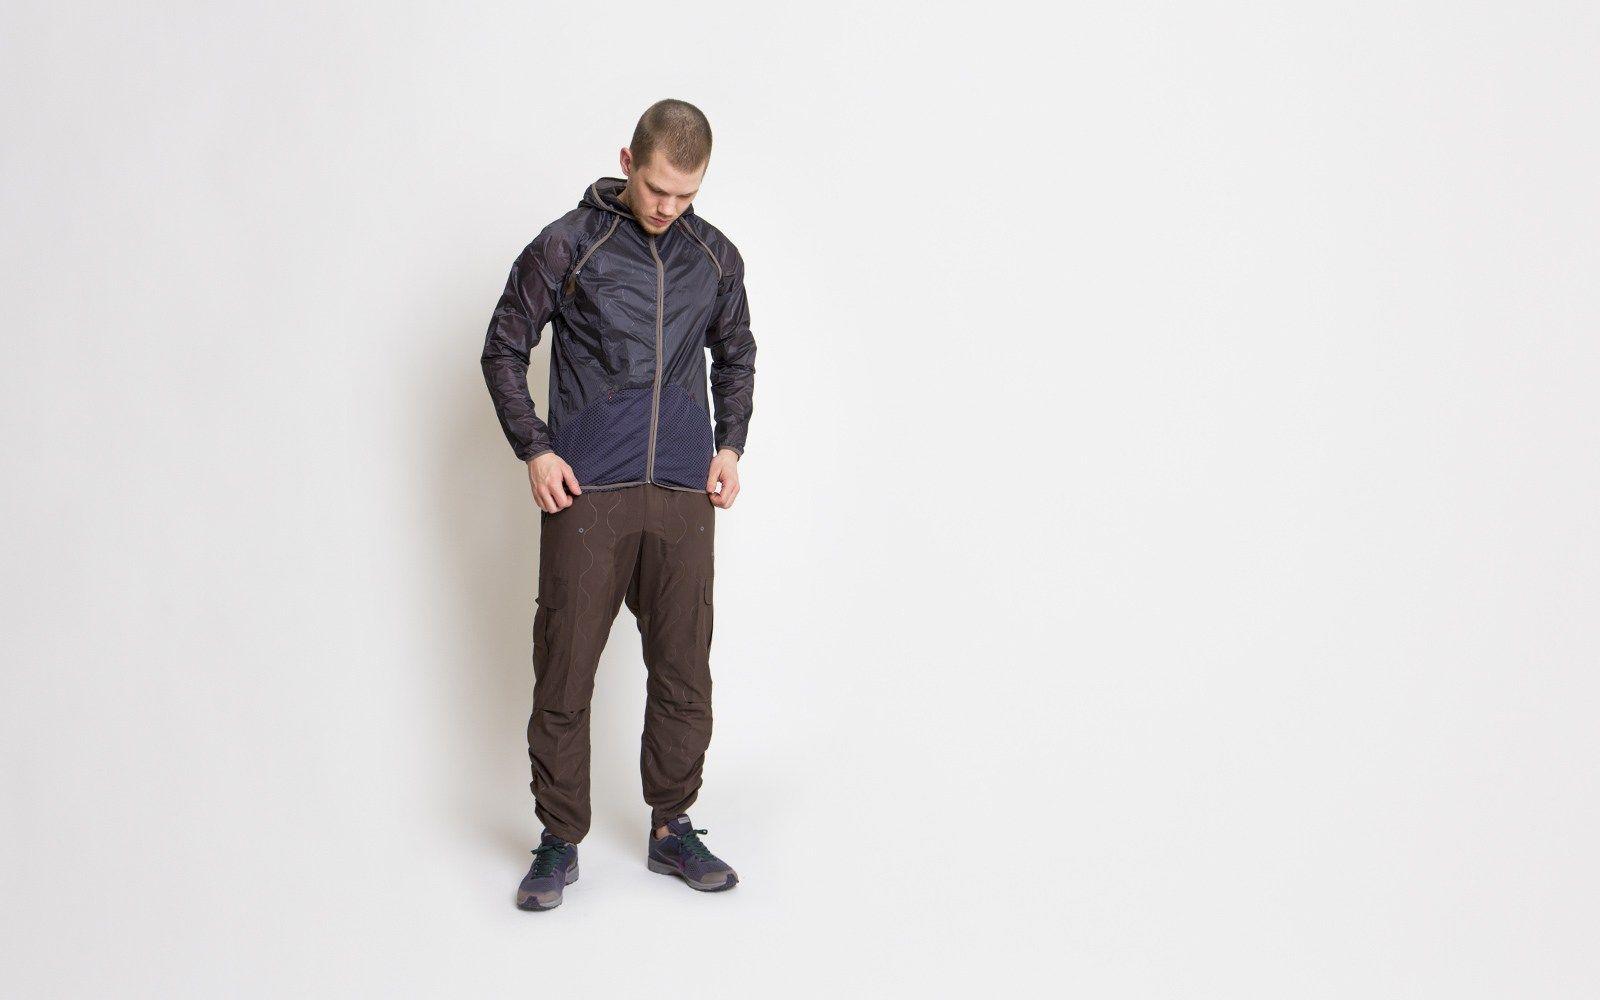 uk availability 409c7 745bb Nike - AS UC Covertible Jacket - 539904-021 - Sneakersnstuff, sneakers    streetwear på nätet sen 1999